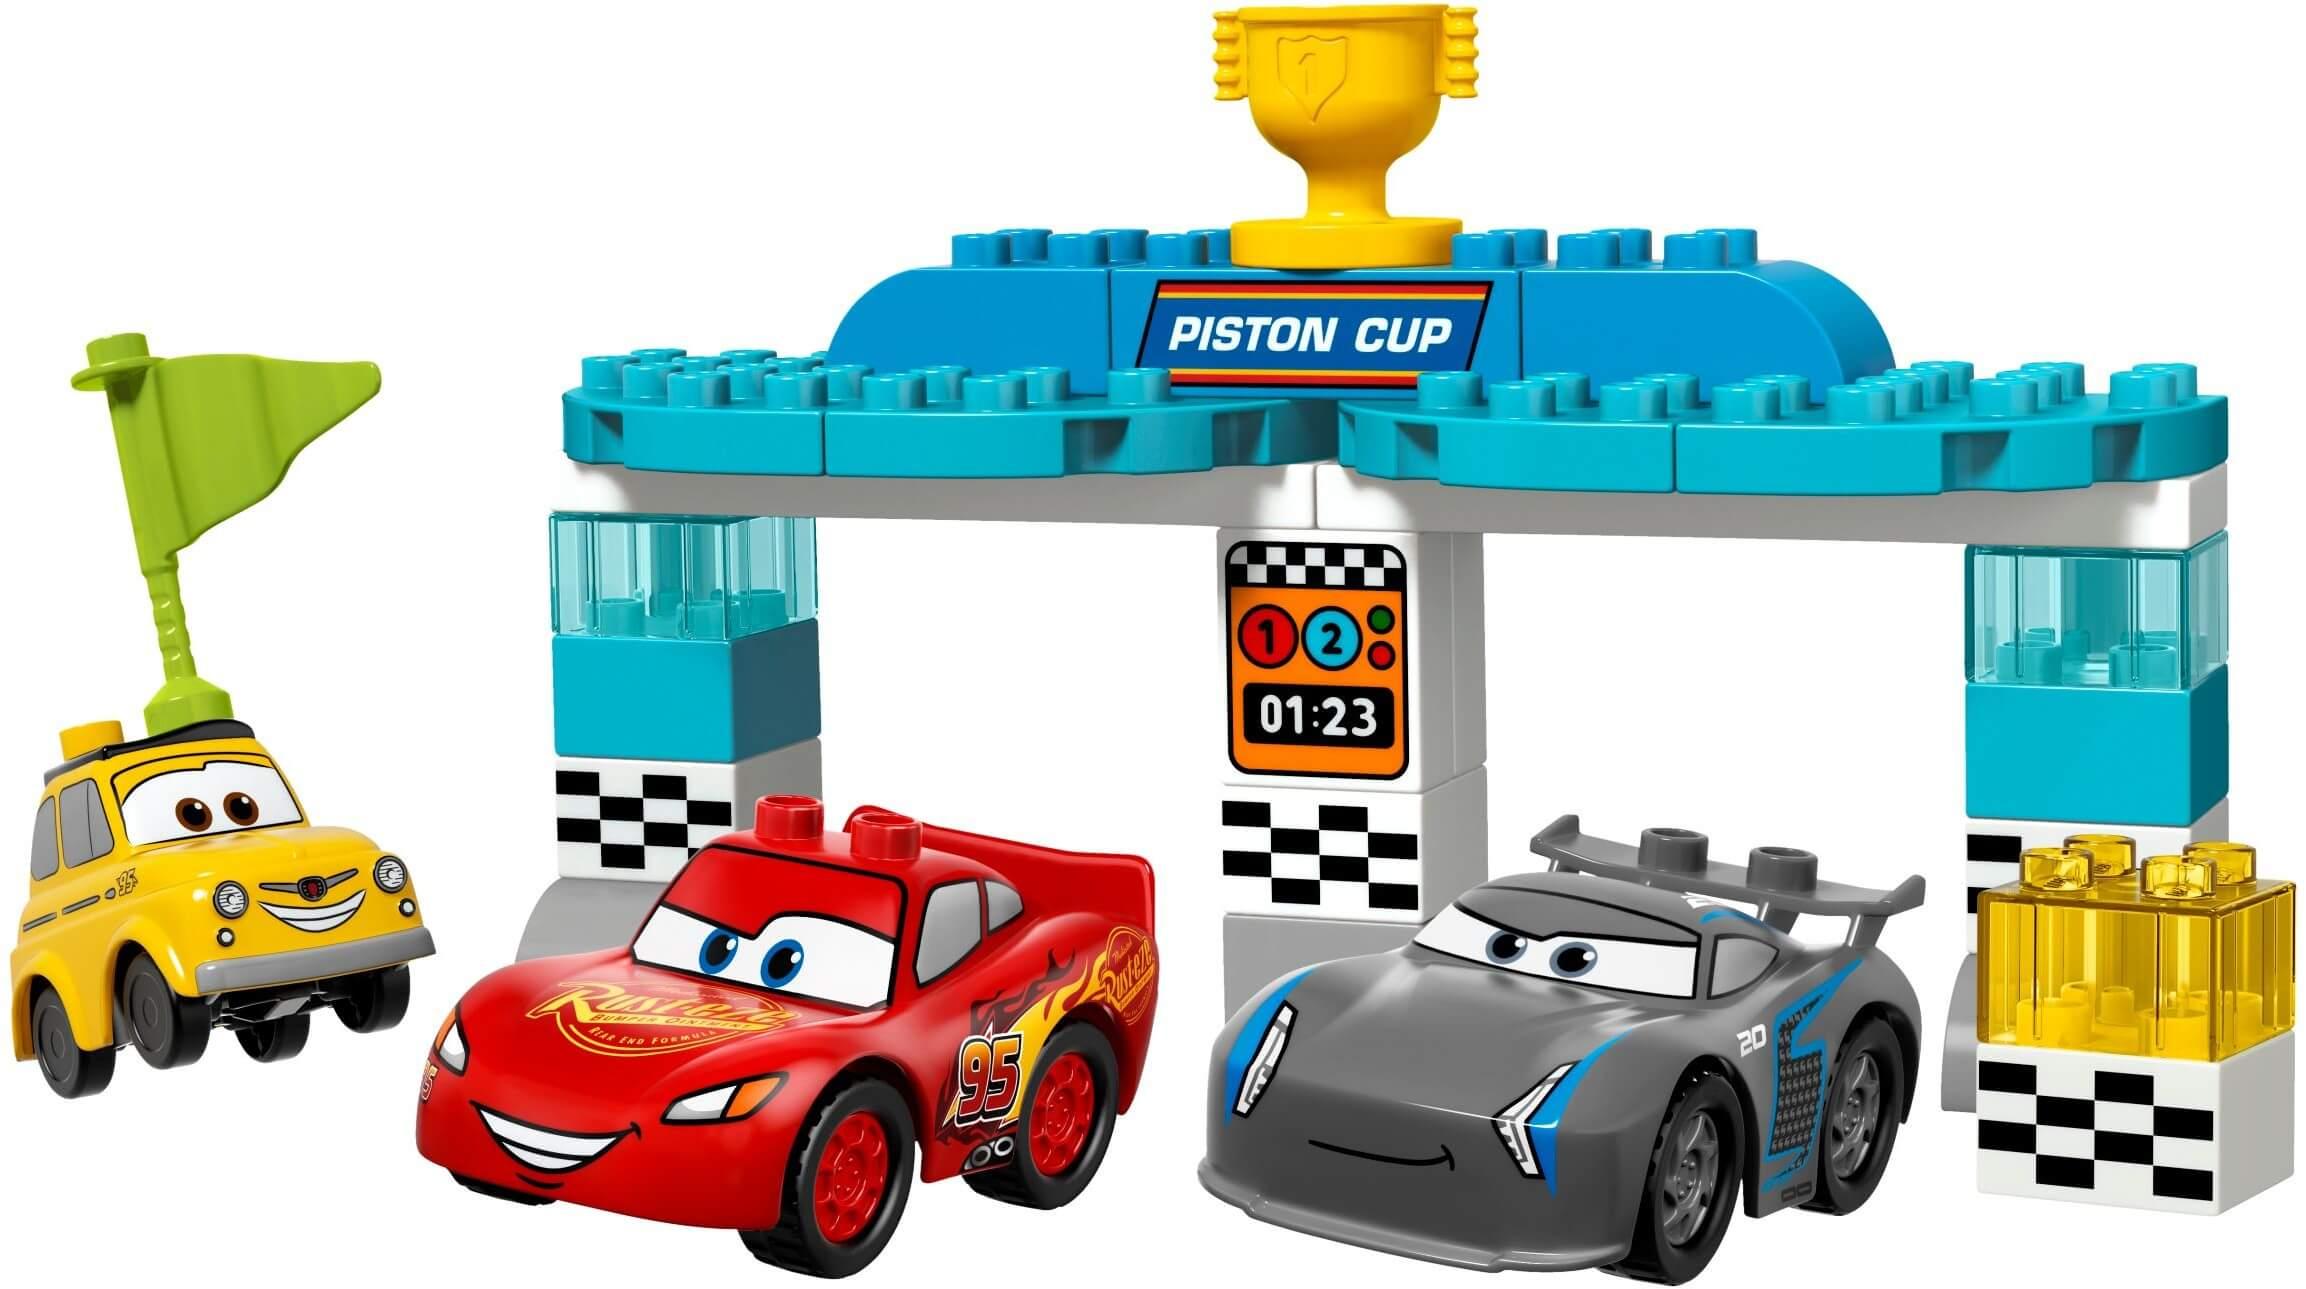 Mua đồ chơi LEGO 10857 - LEGO Duplo 10857 - Cuộc Đua Giành Cúp Piston (LEGO Duplo Cars 3: Piston Cup Rate)